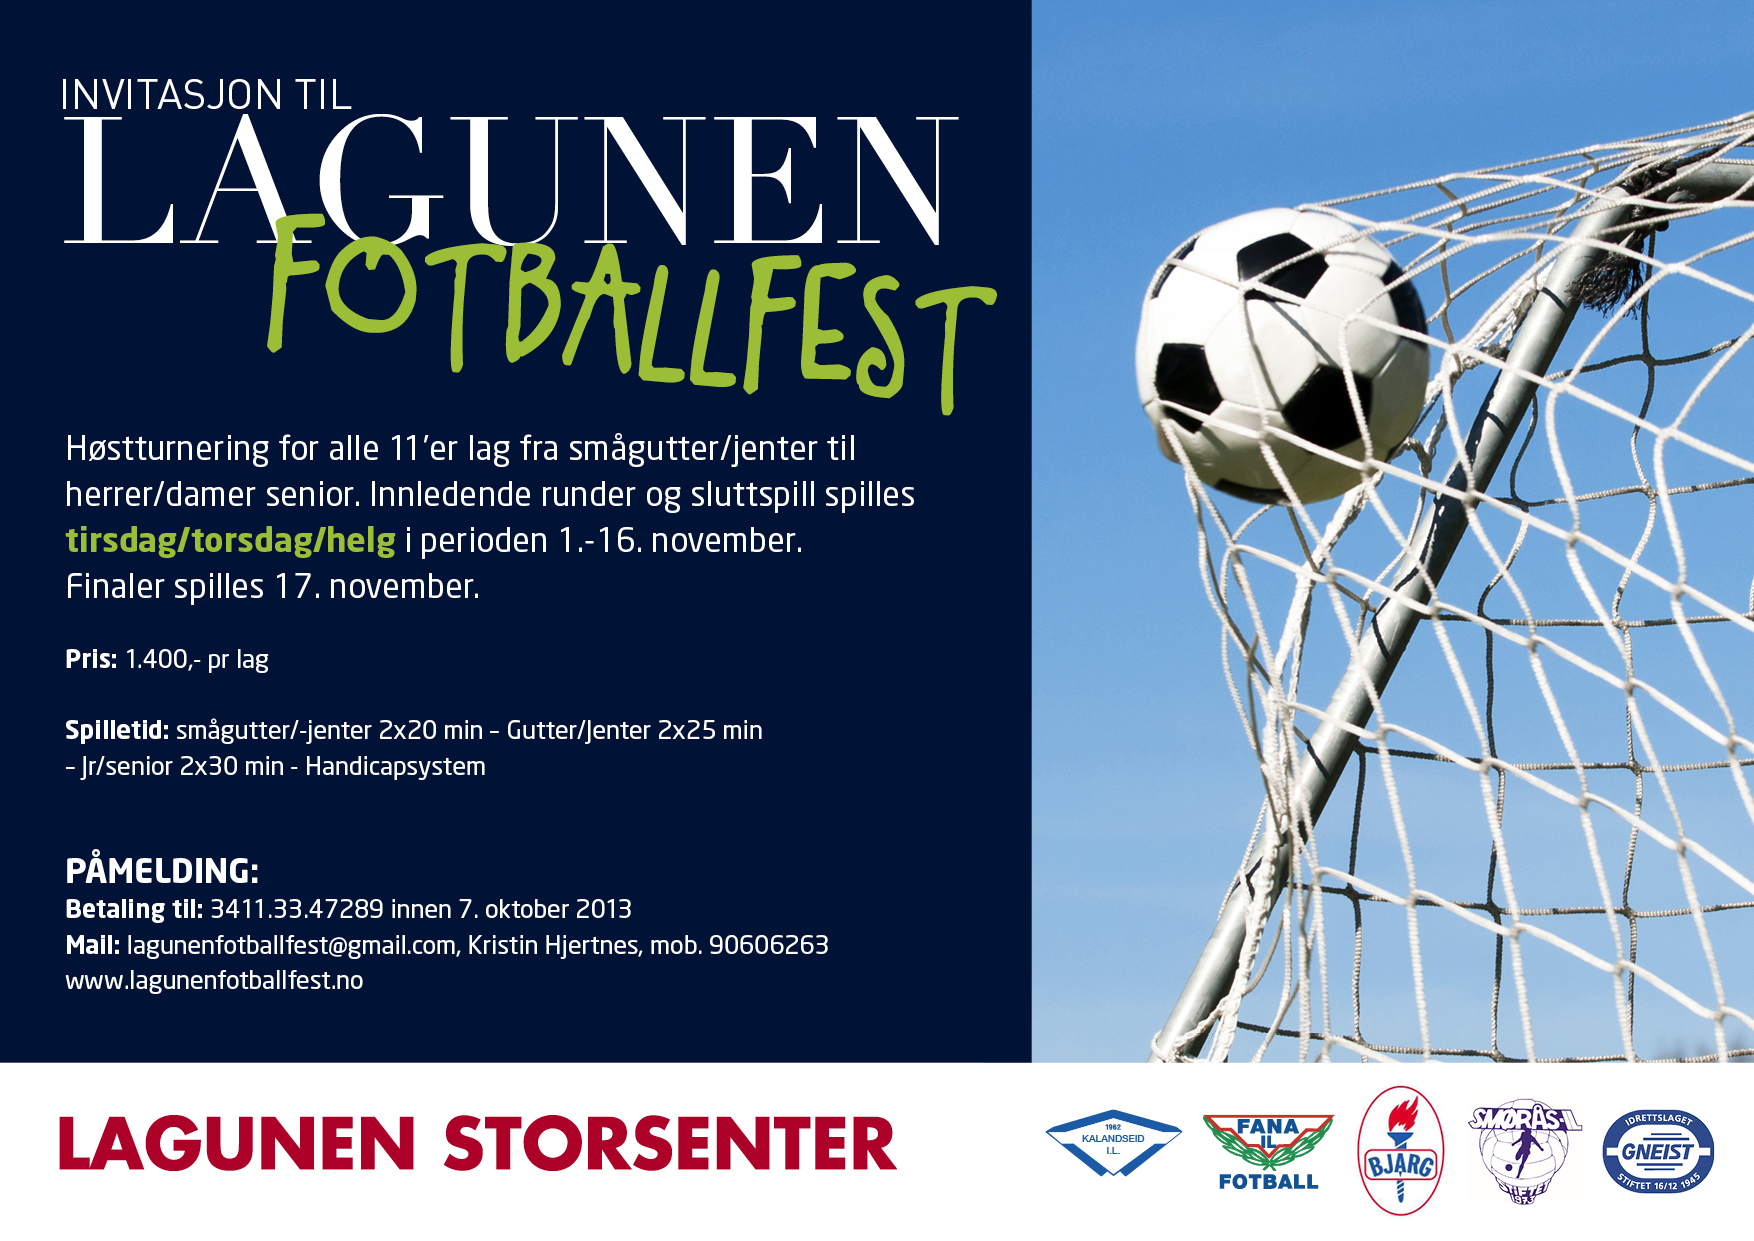 lagunen fotballfest